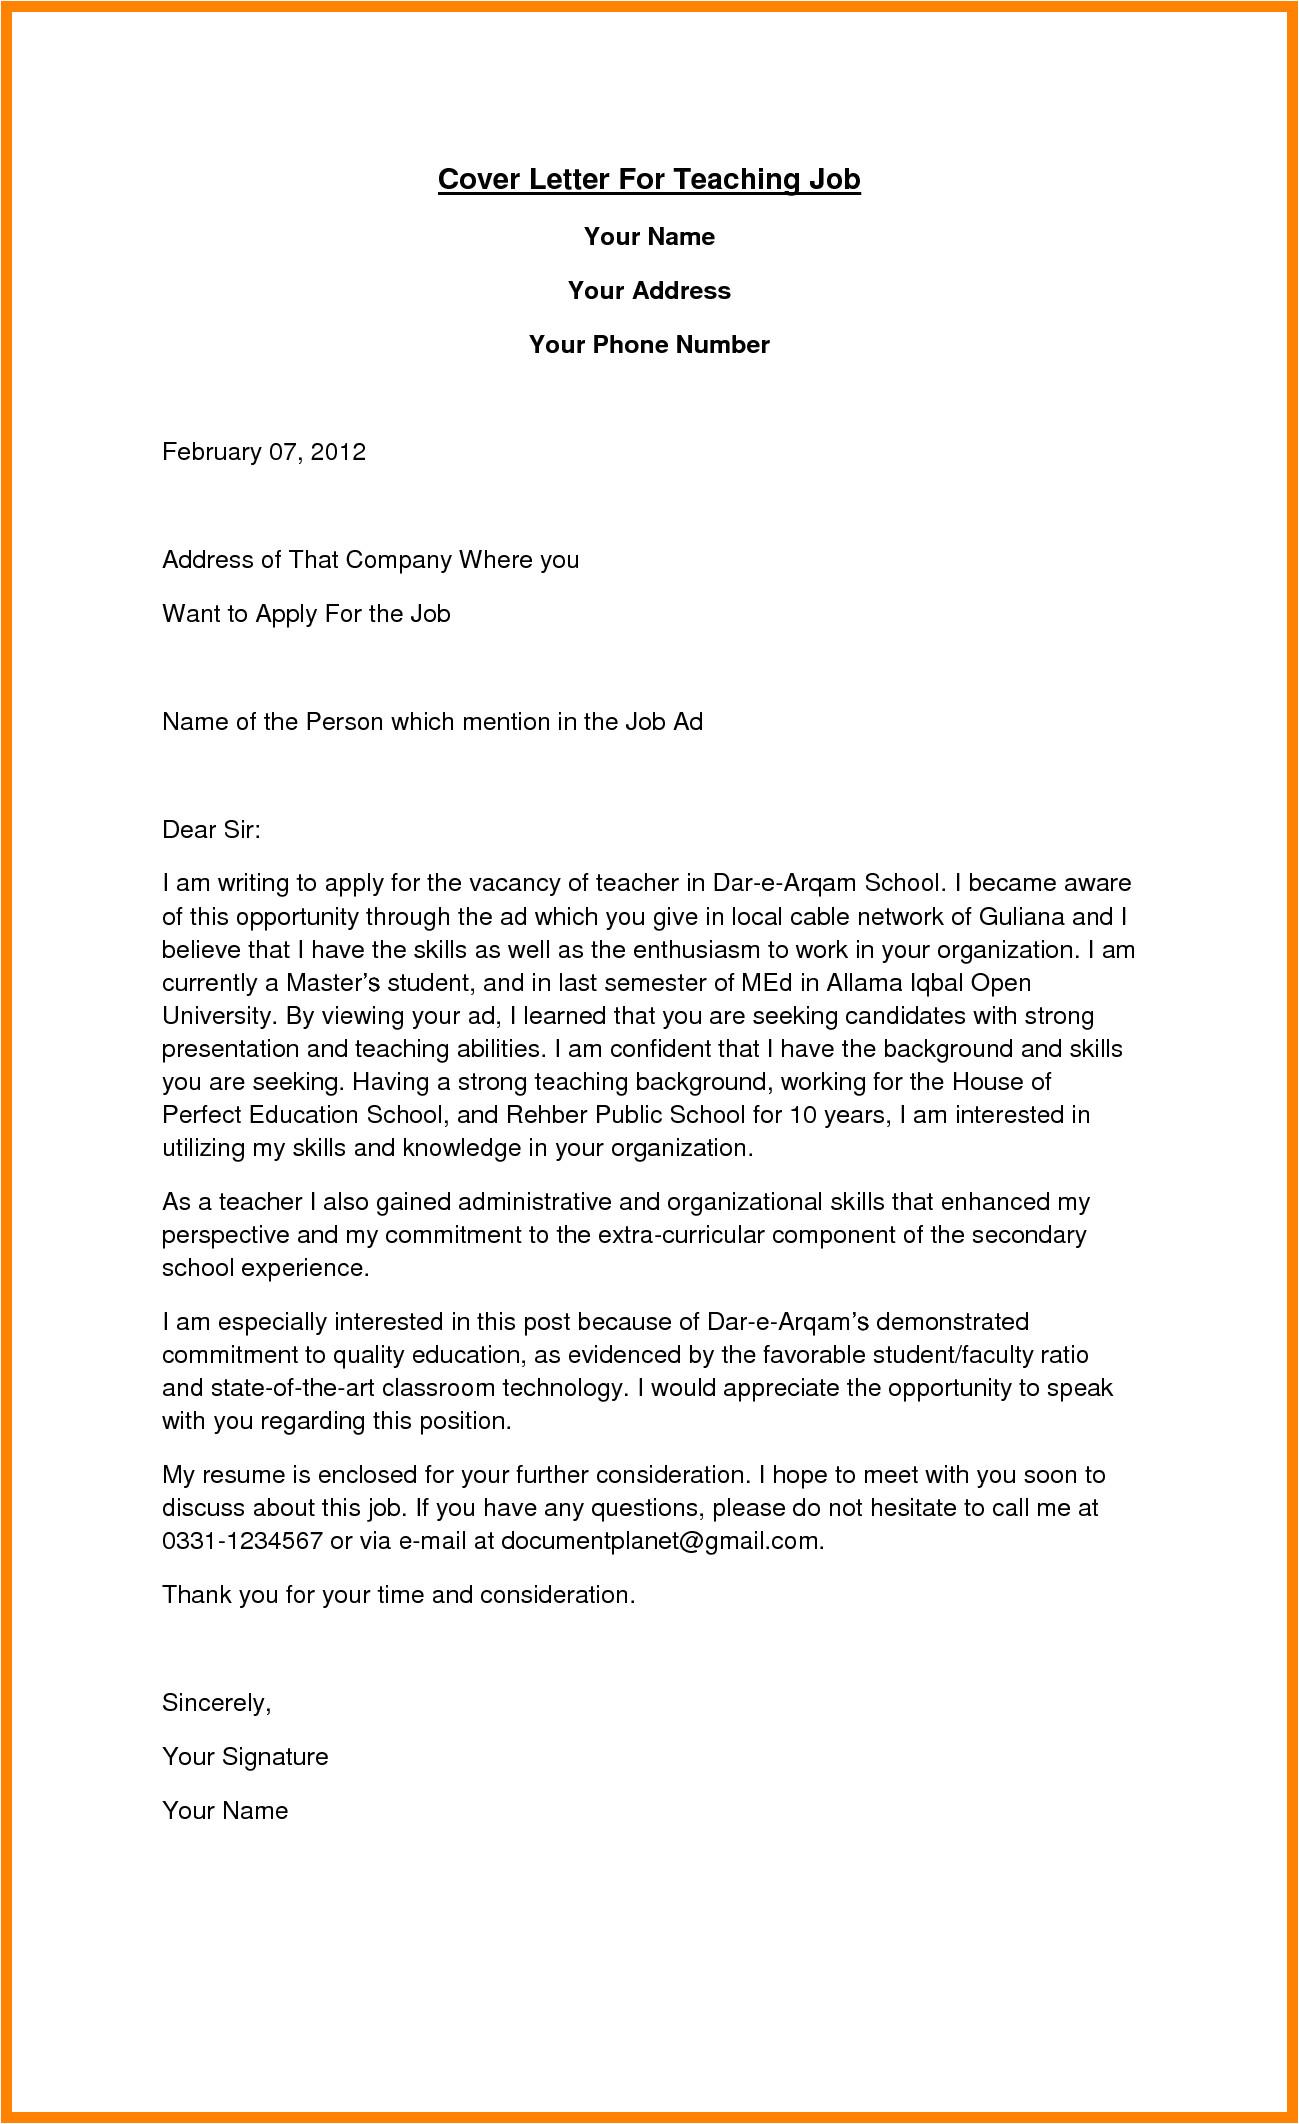 Cover Letter for Teaching Position at University 12 Employment Letter as A Teacher Bike Friendly Windsor